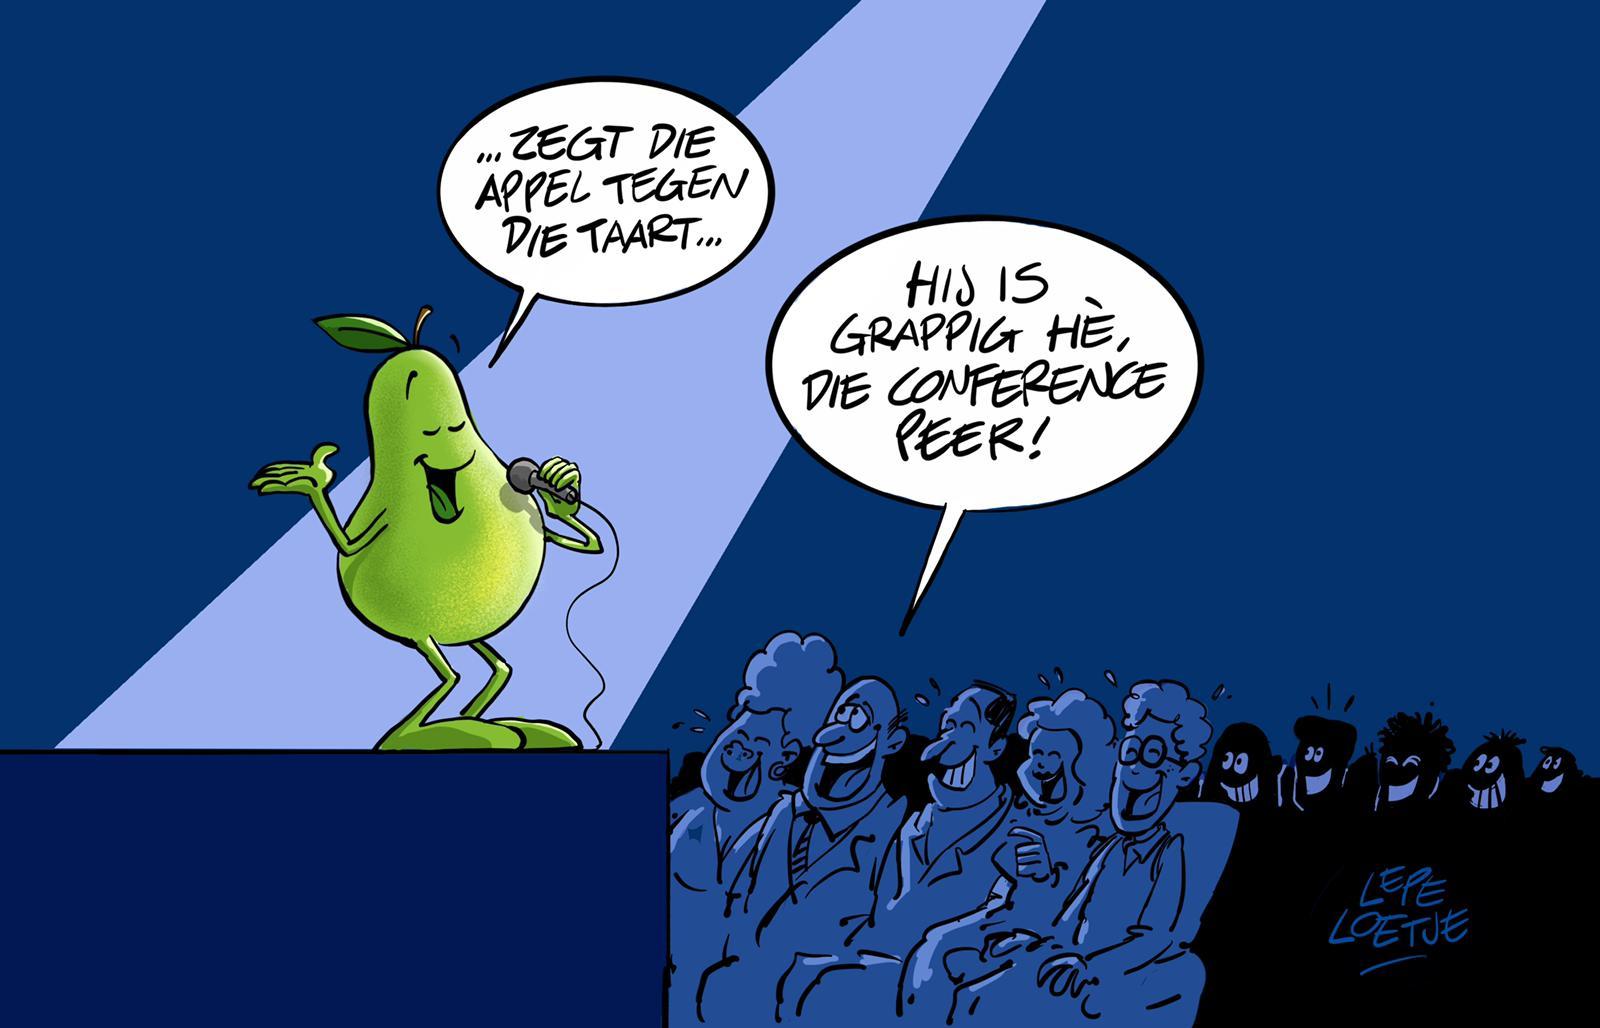 Lepe Loetje Cartoons Conference Peer